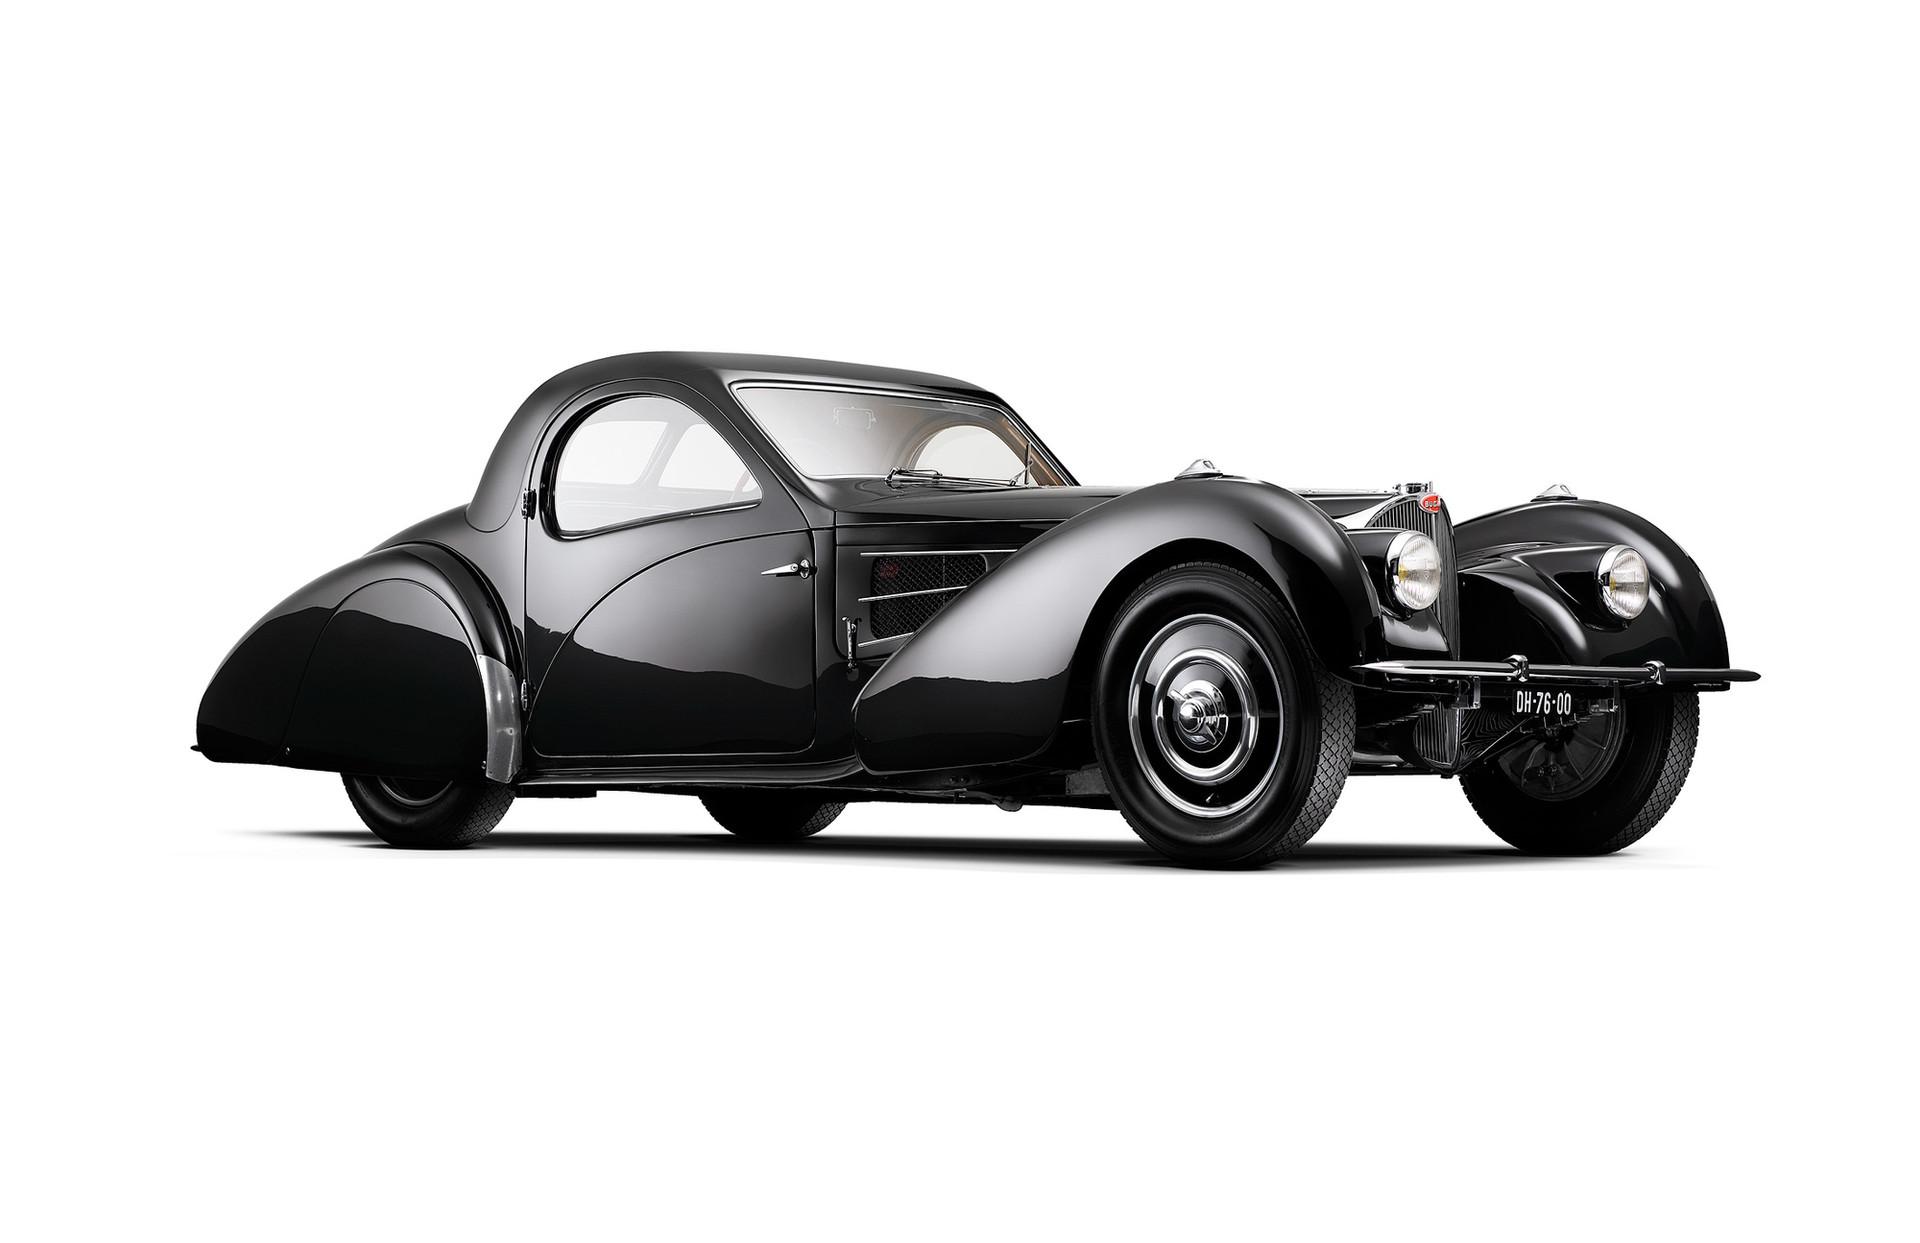 c04 Bugatti-3-4-front-David-de-Jong-.jpg